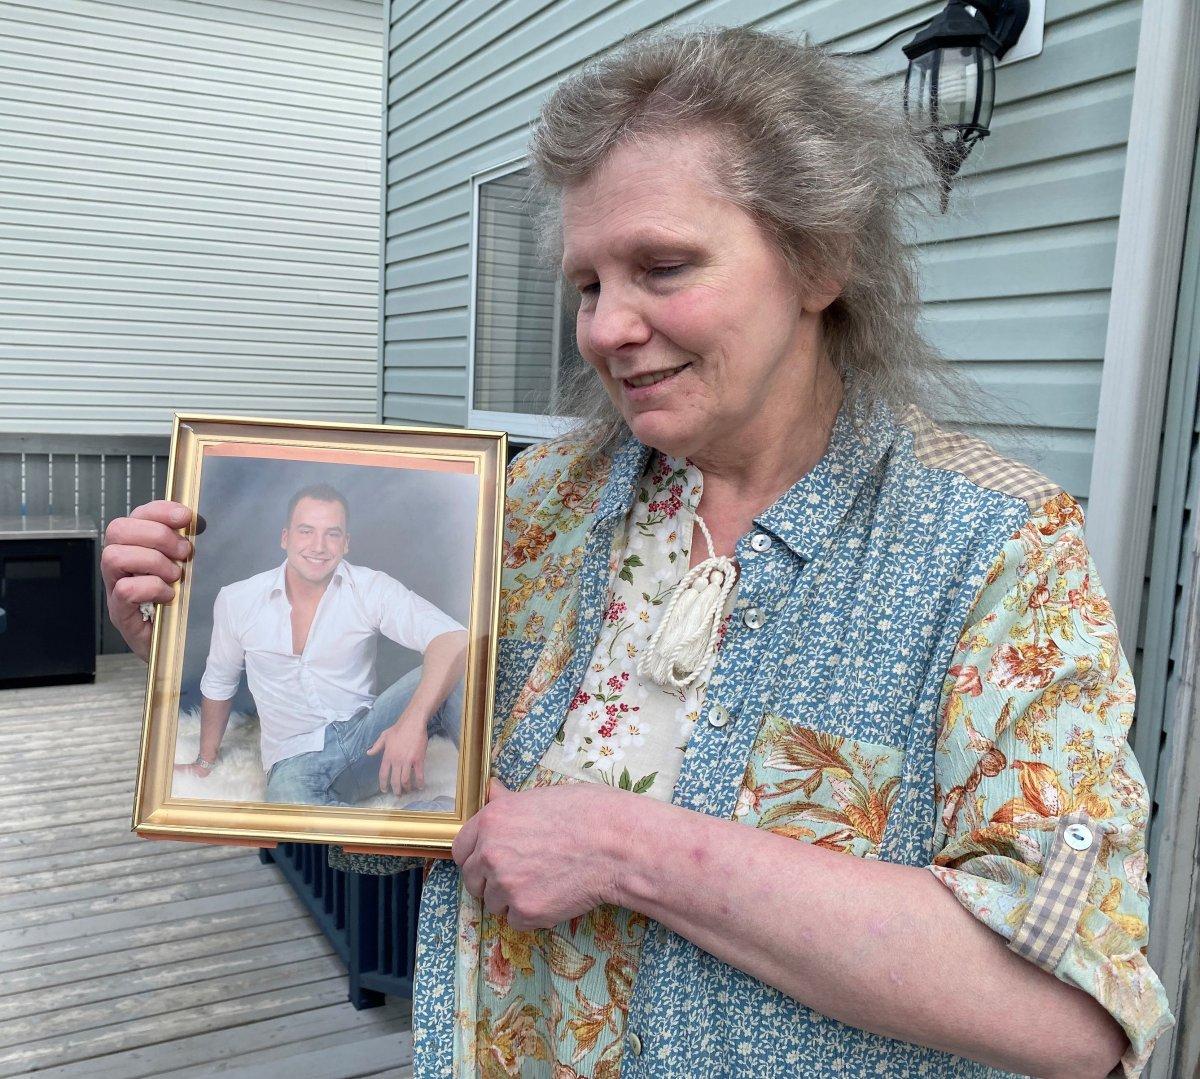 Maryann Reinke holds a photograph of her son, Gavin Zima, on May 17 2021.